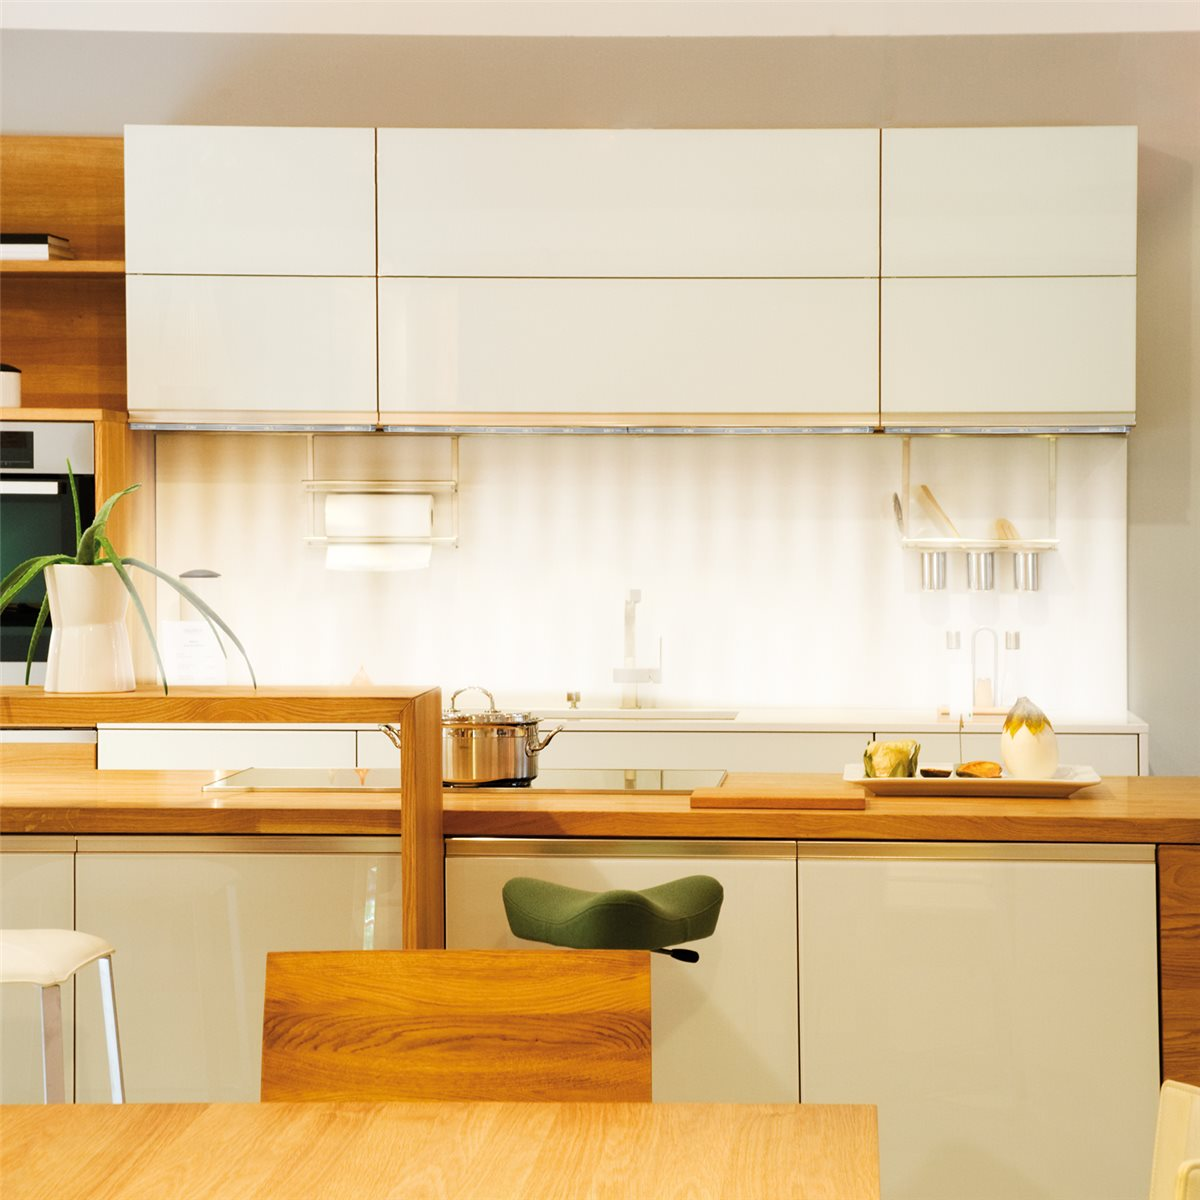 lampenlux led unterbauleuchte akani unterbaulampe. Black Bedroom Furniture Sets. Home Design Ideas